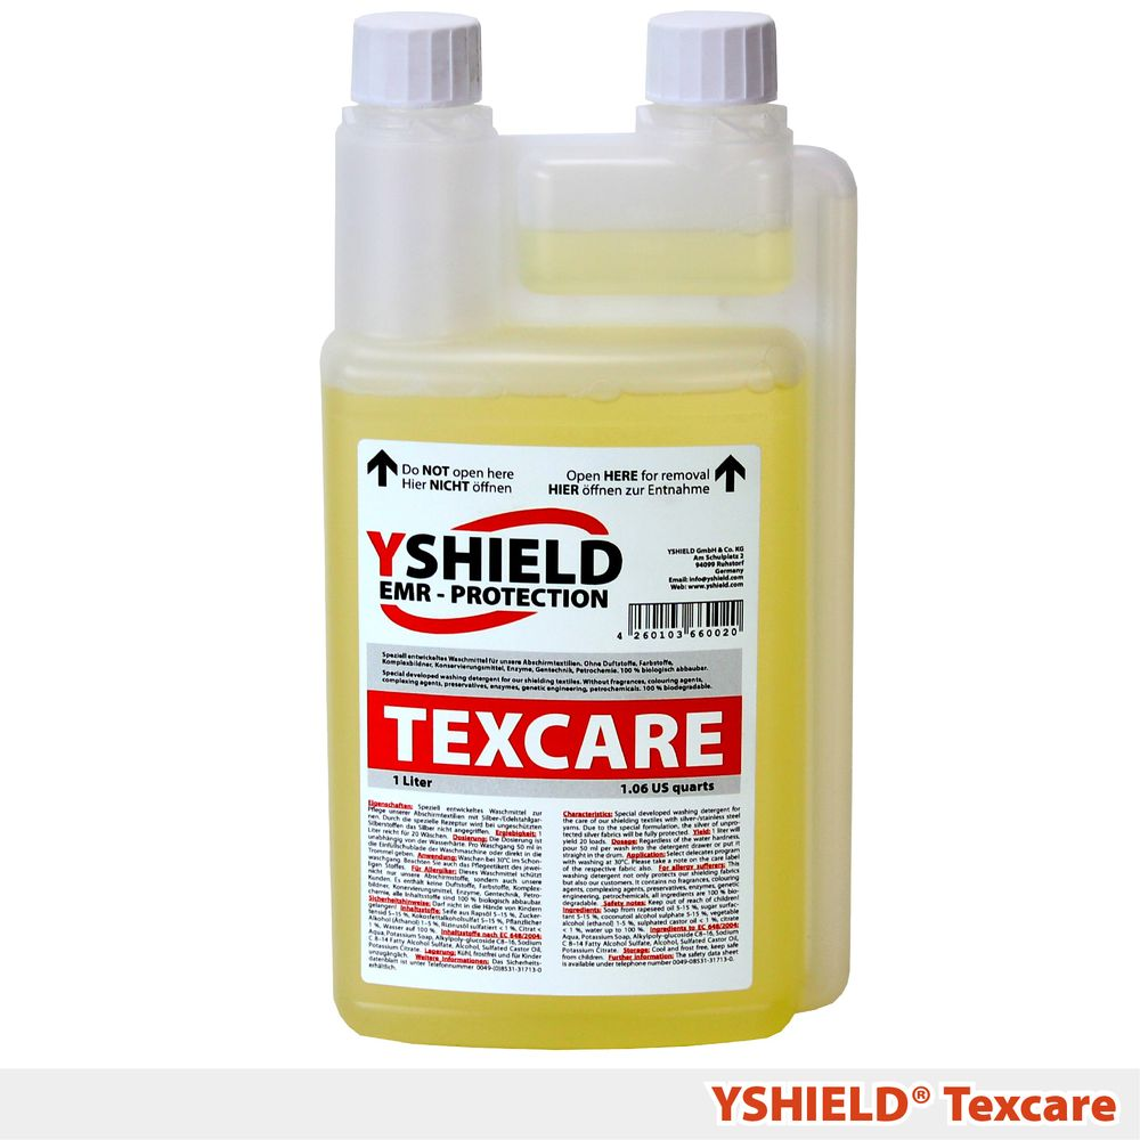 YSHIELD® Liquid detergent TEXCARE for shielding fabrics | 1 liter